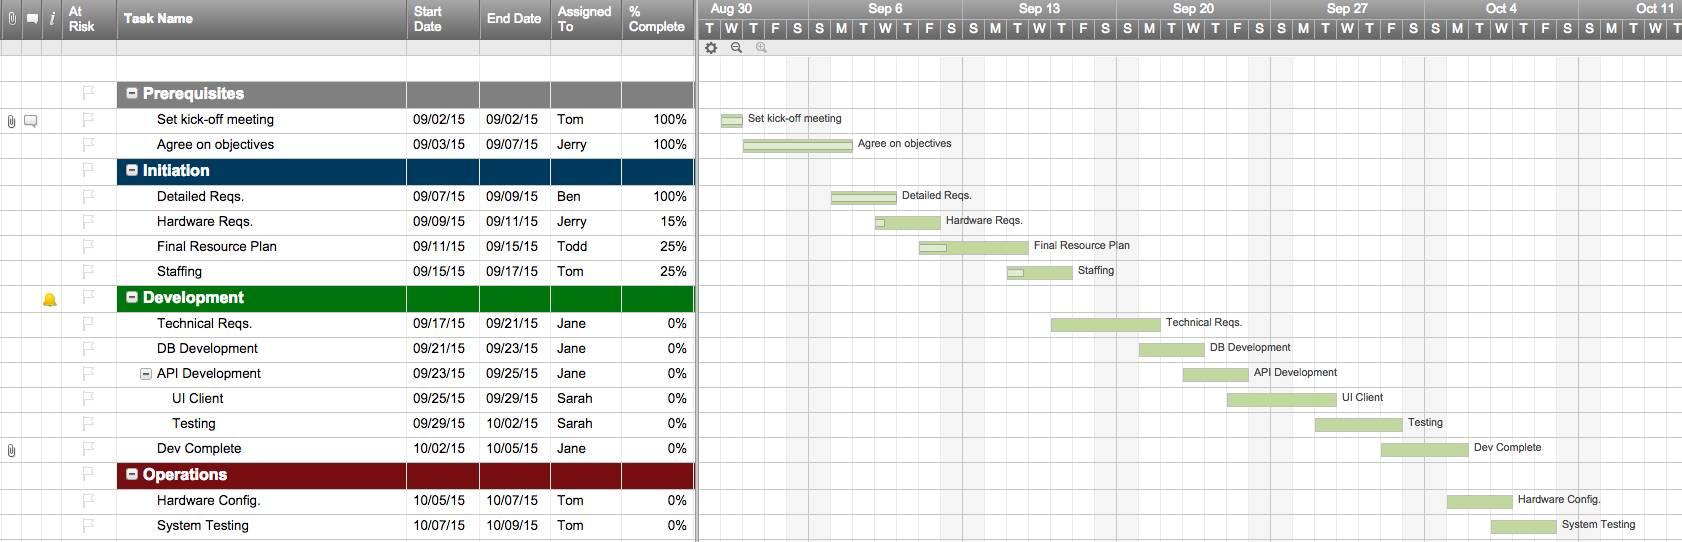 Software Project Plan Template Xls